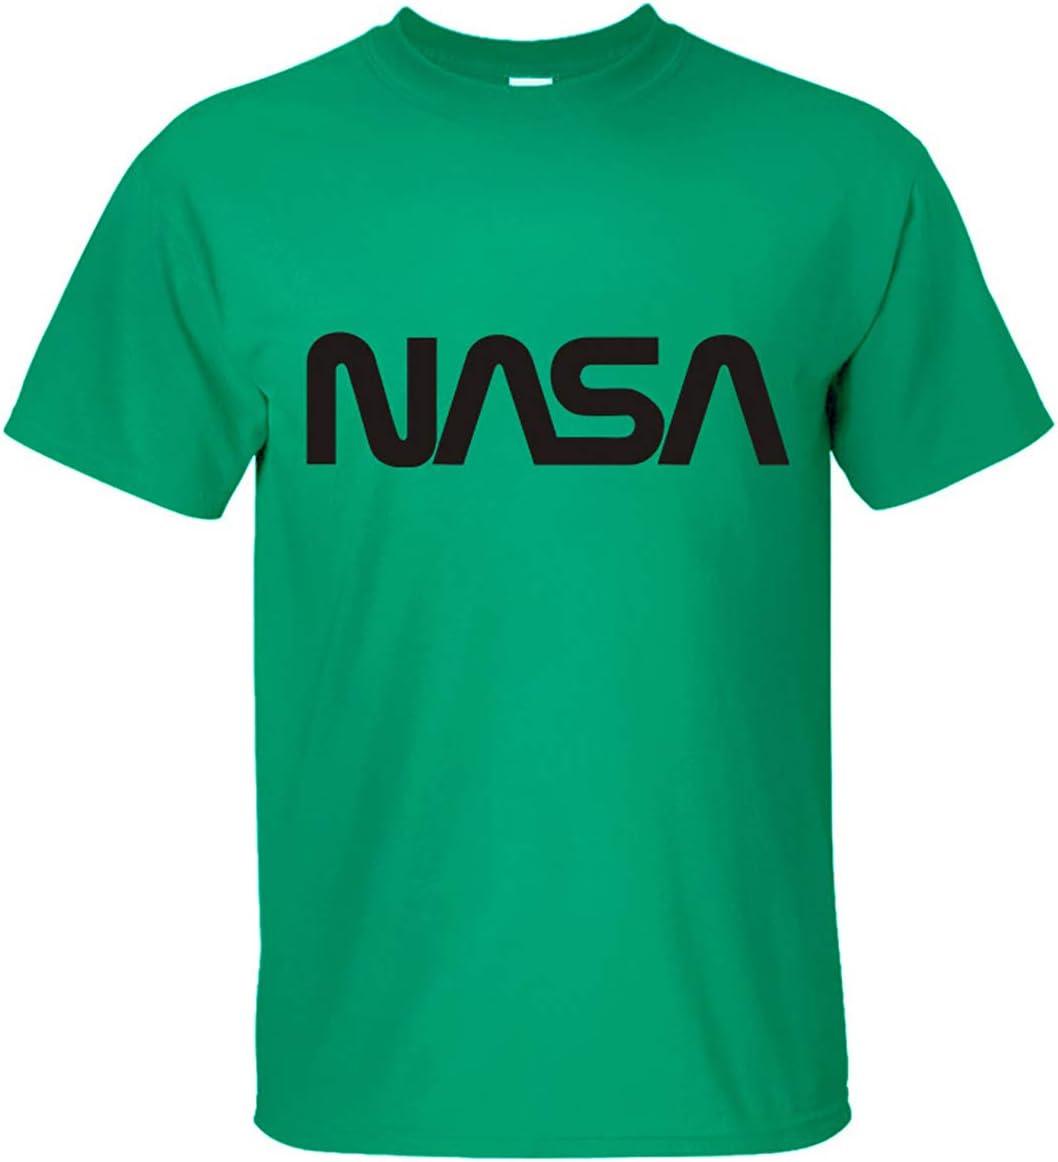 NASA Worm Camiseta NASA Space Program Logo Camiseta para Hombre Manga Corta 100% Camiseta de Algodón,Green,L: Amazon.es: Hogar